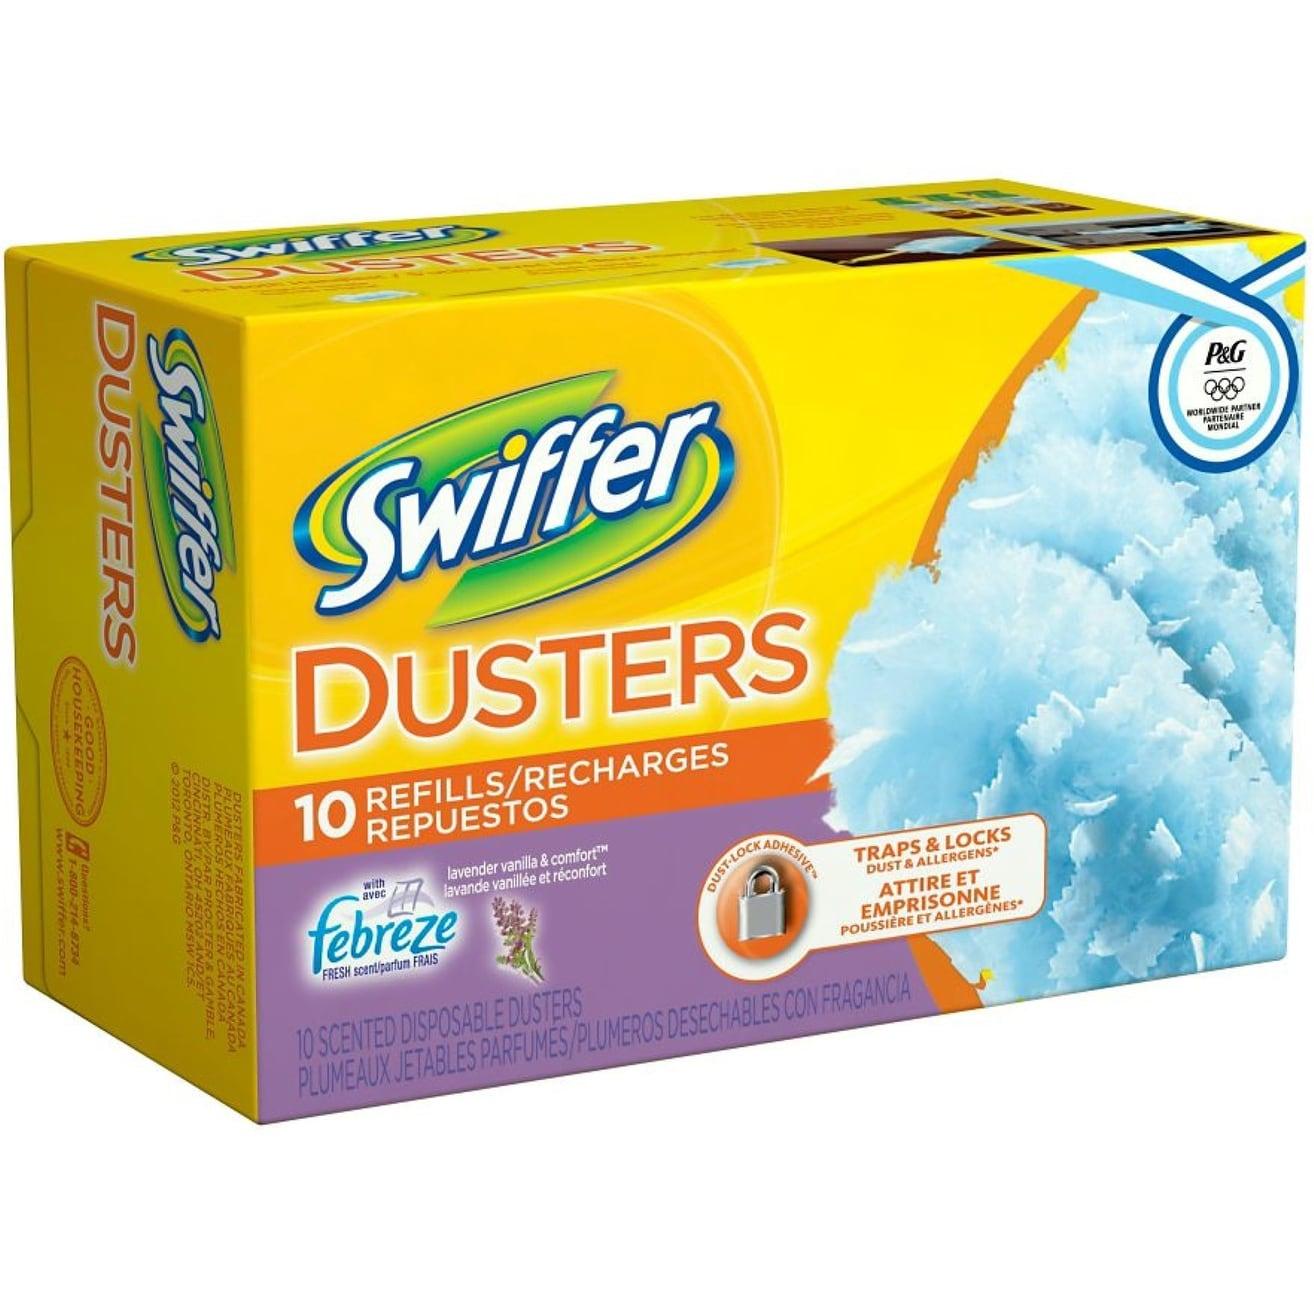 Swiffer Housewares Shop Our Best Home Goods Deals Online